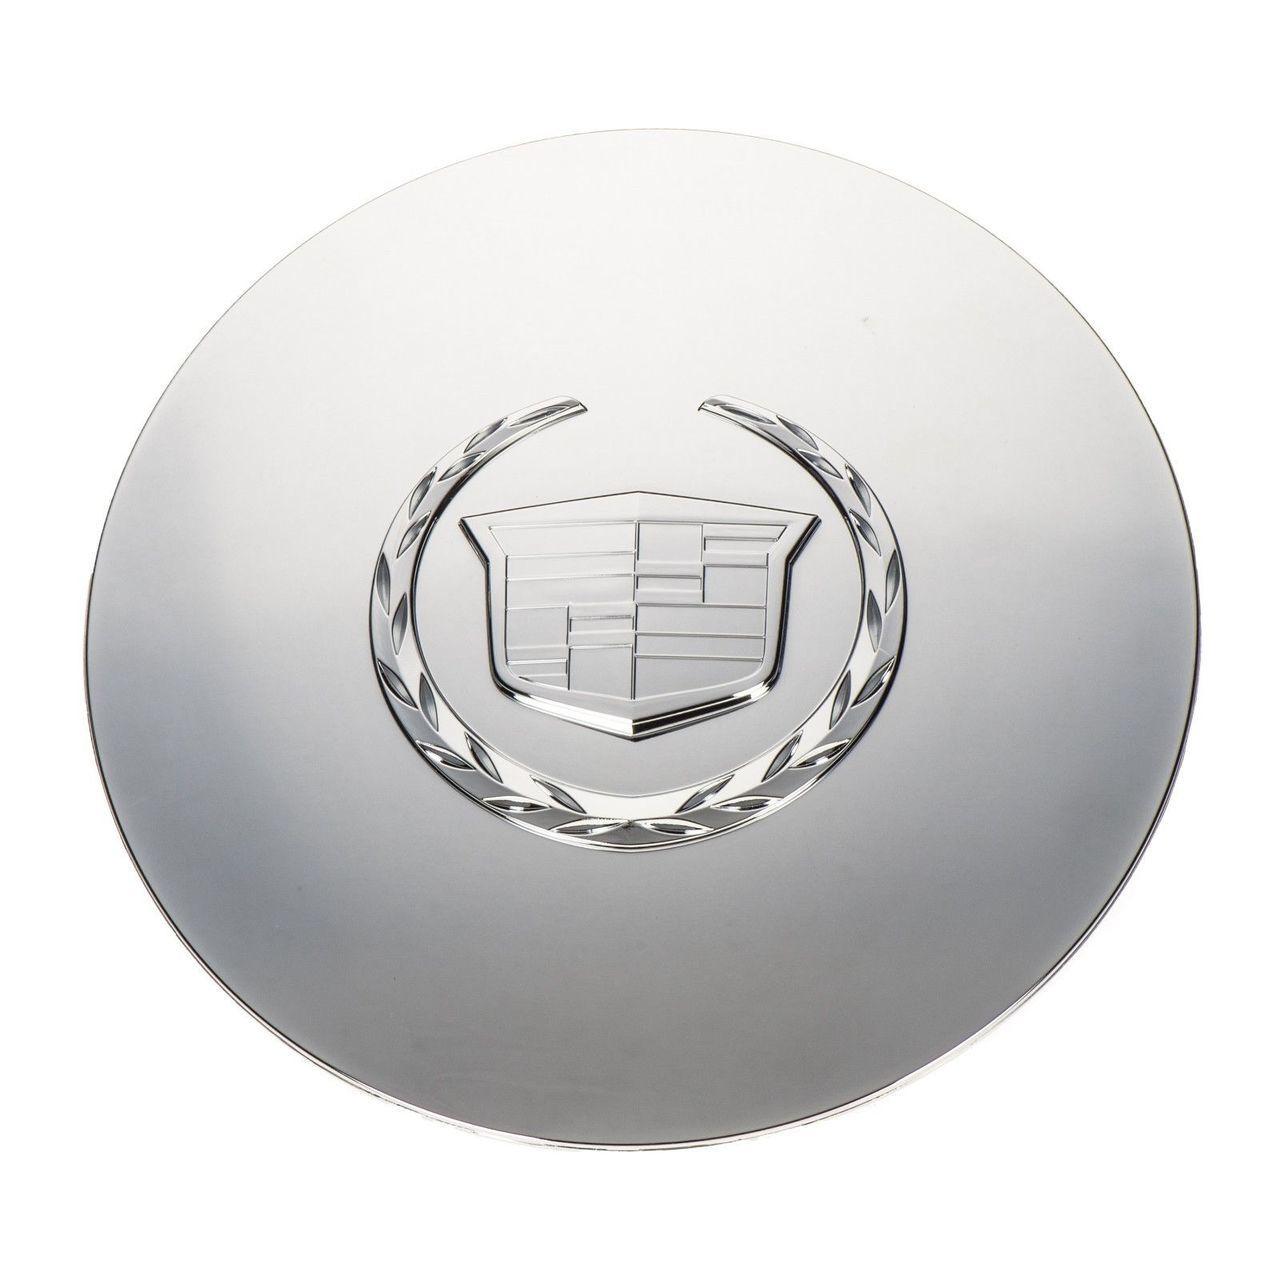 1 96 97 98 99 00 01 02 Cadillac Eldorado Seville chrome center cap 9592206 OEM